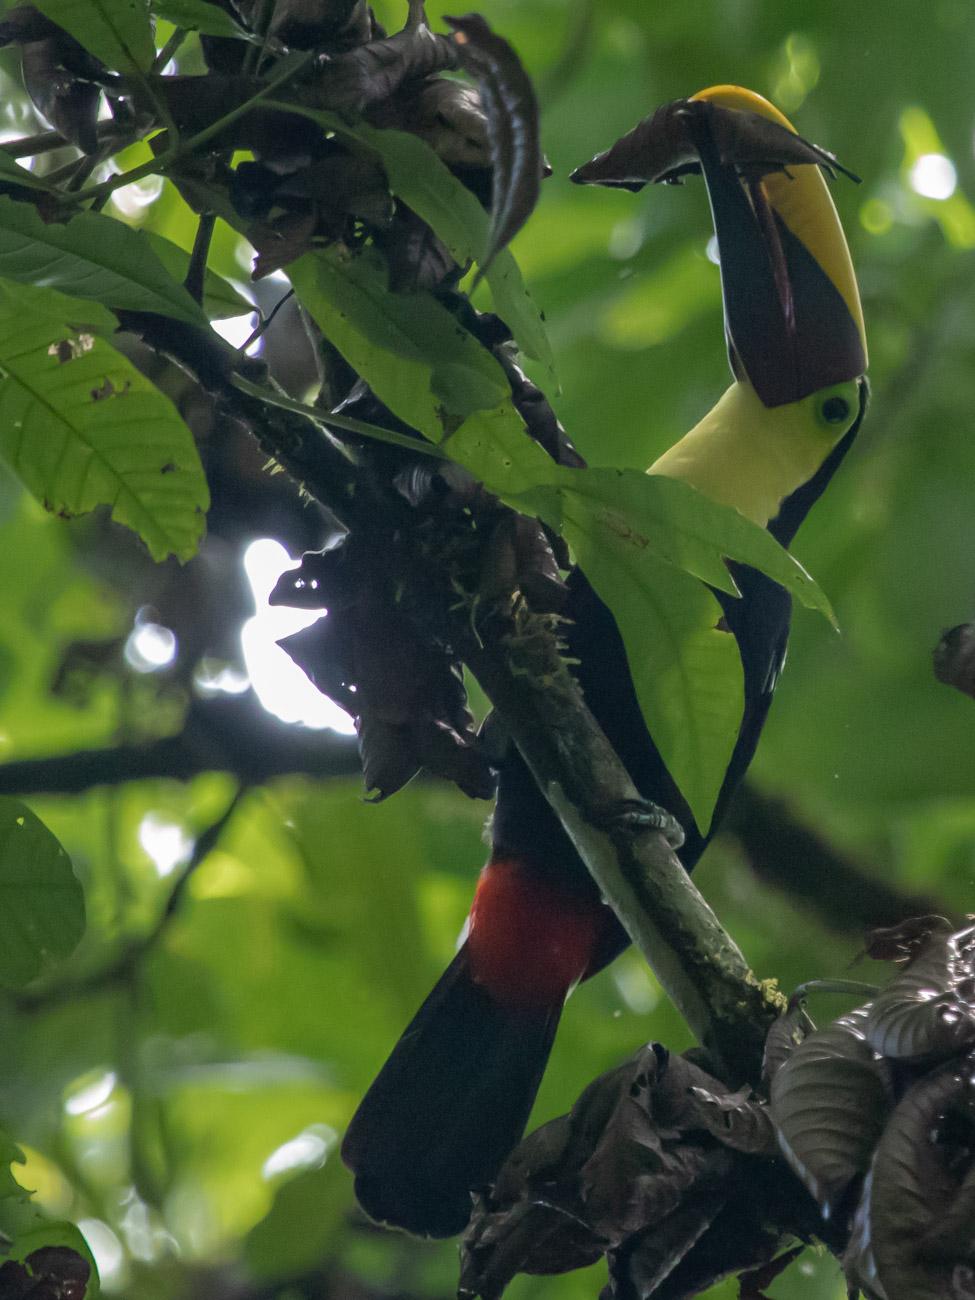 Chestnut-Mandibled Toucan - Corcovado National Park